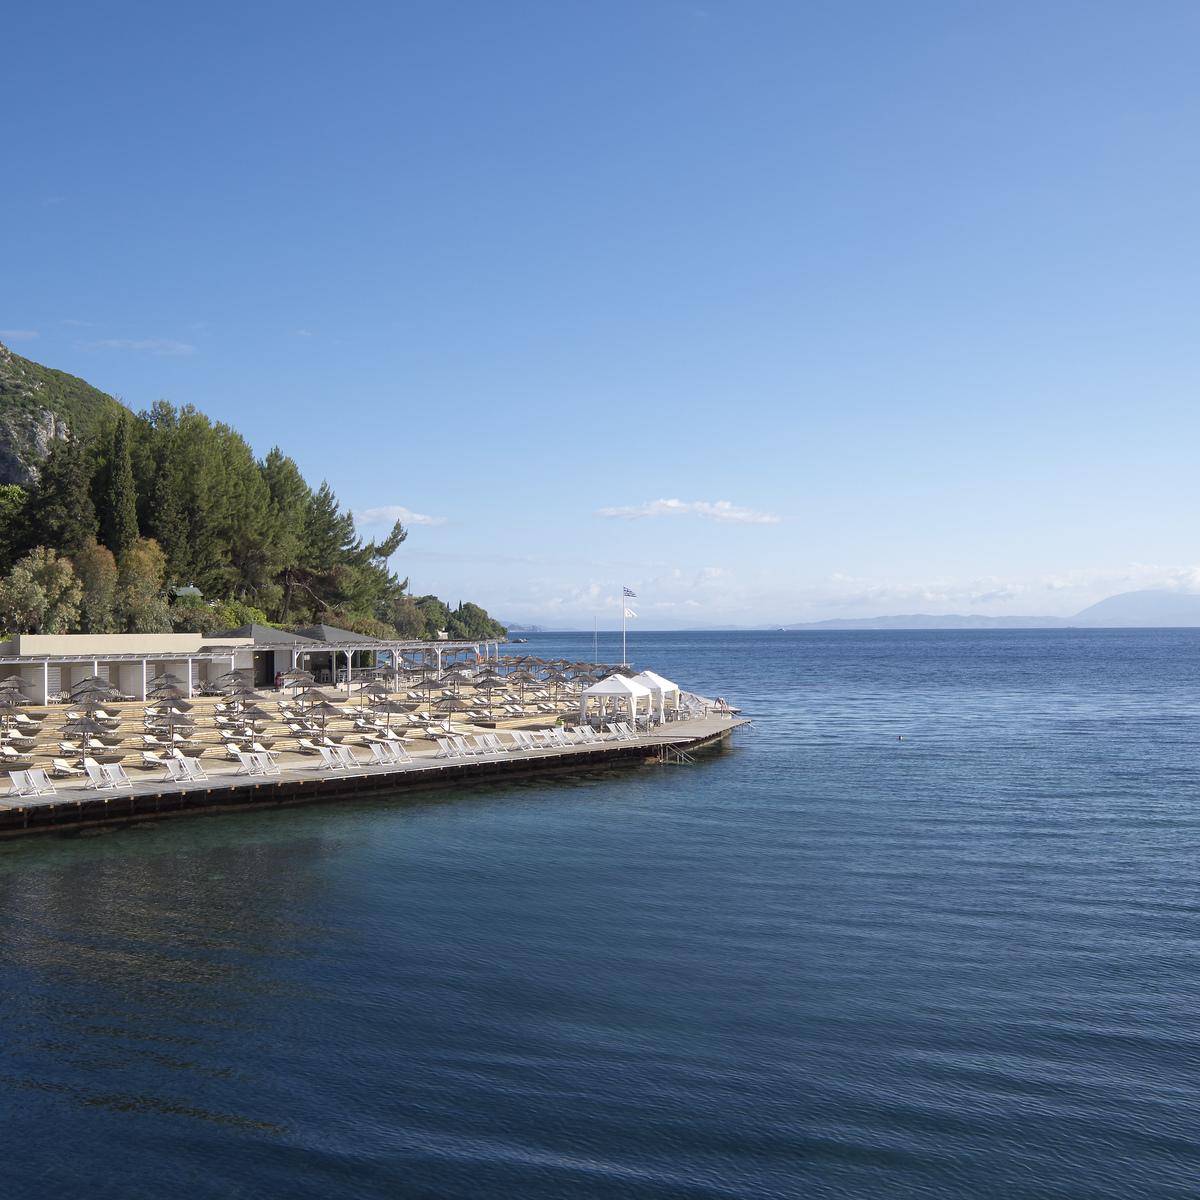 Beach sea - Корфу. Луга Посидонии